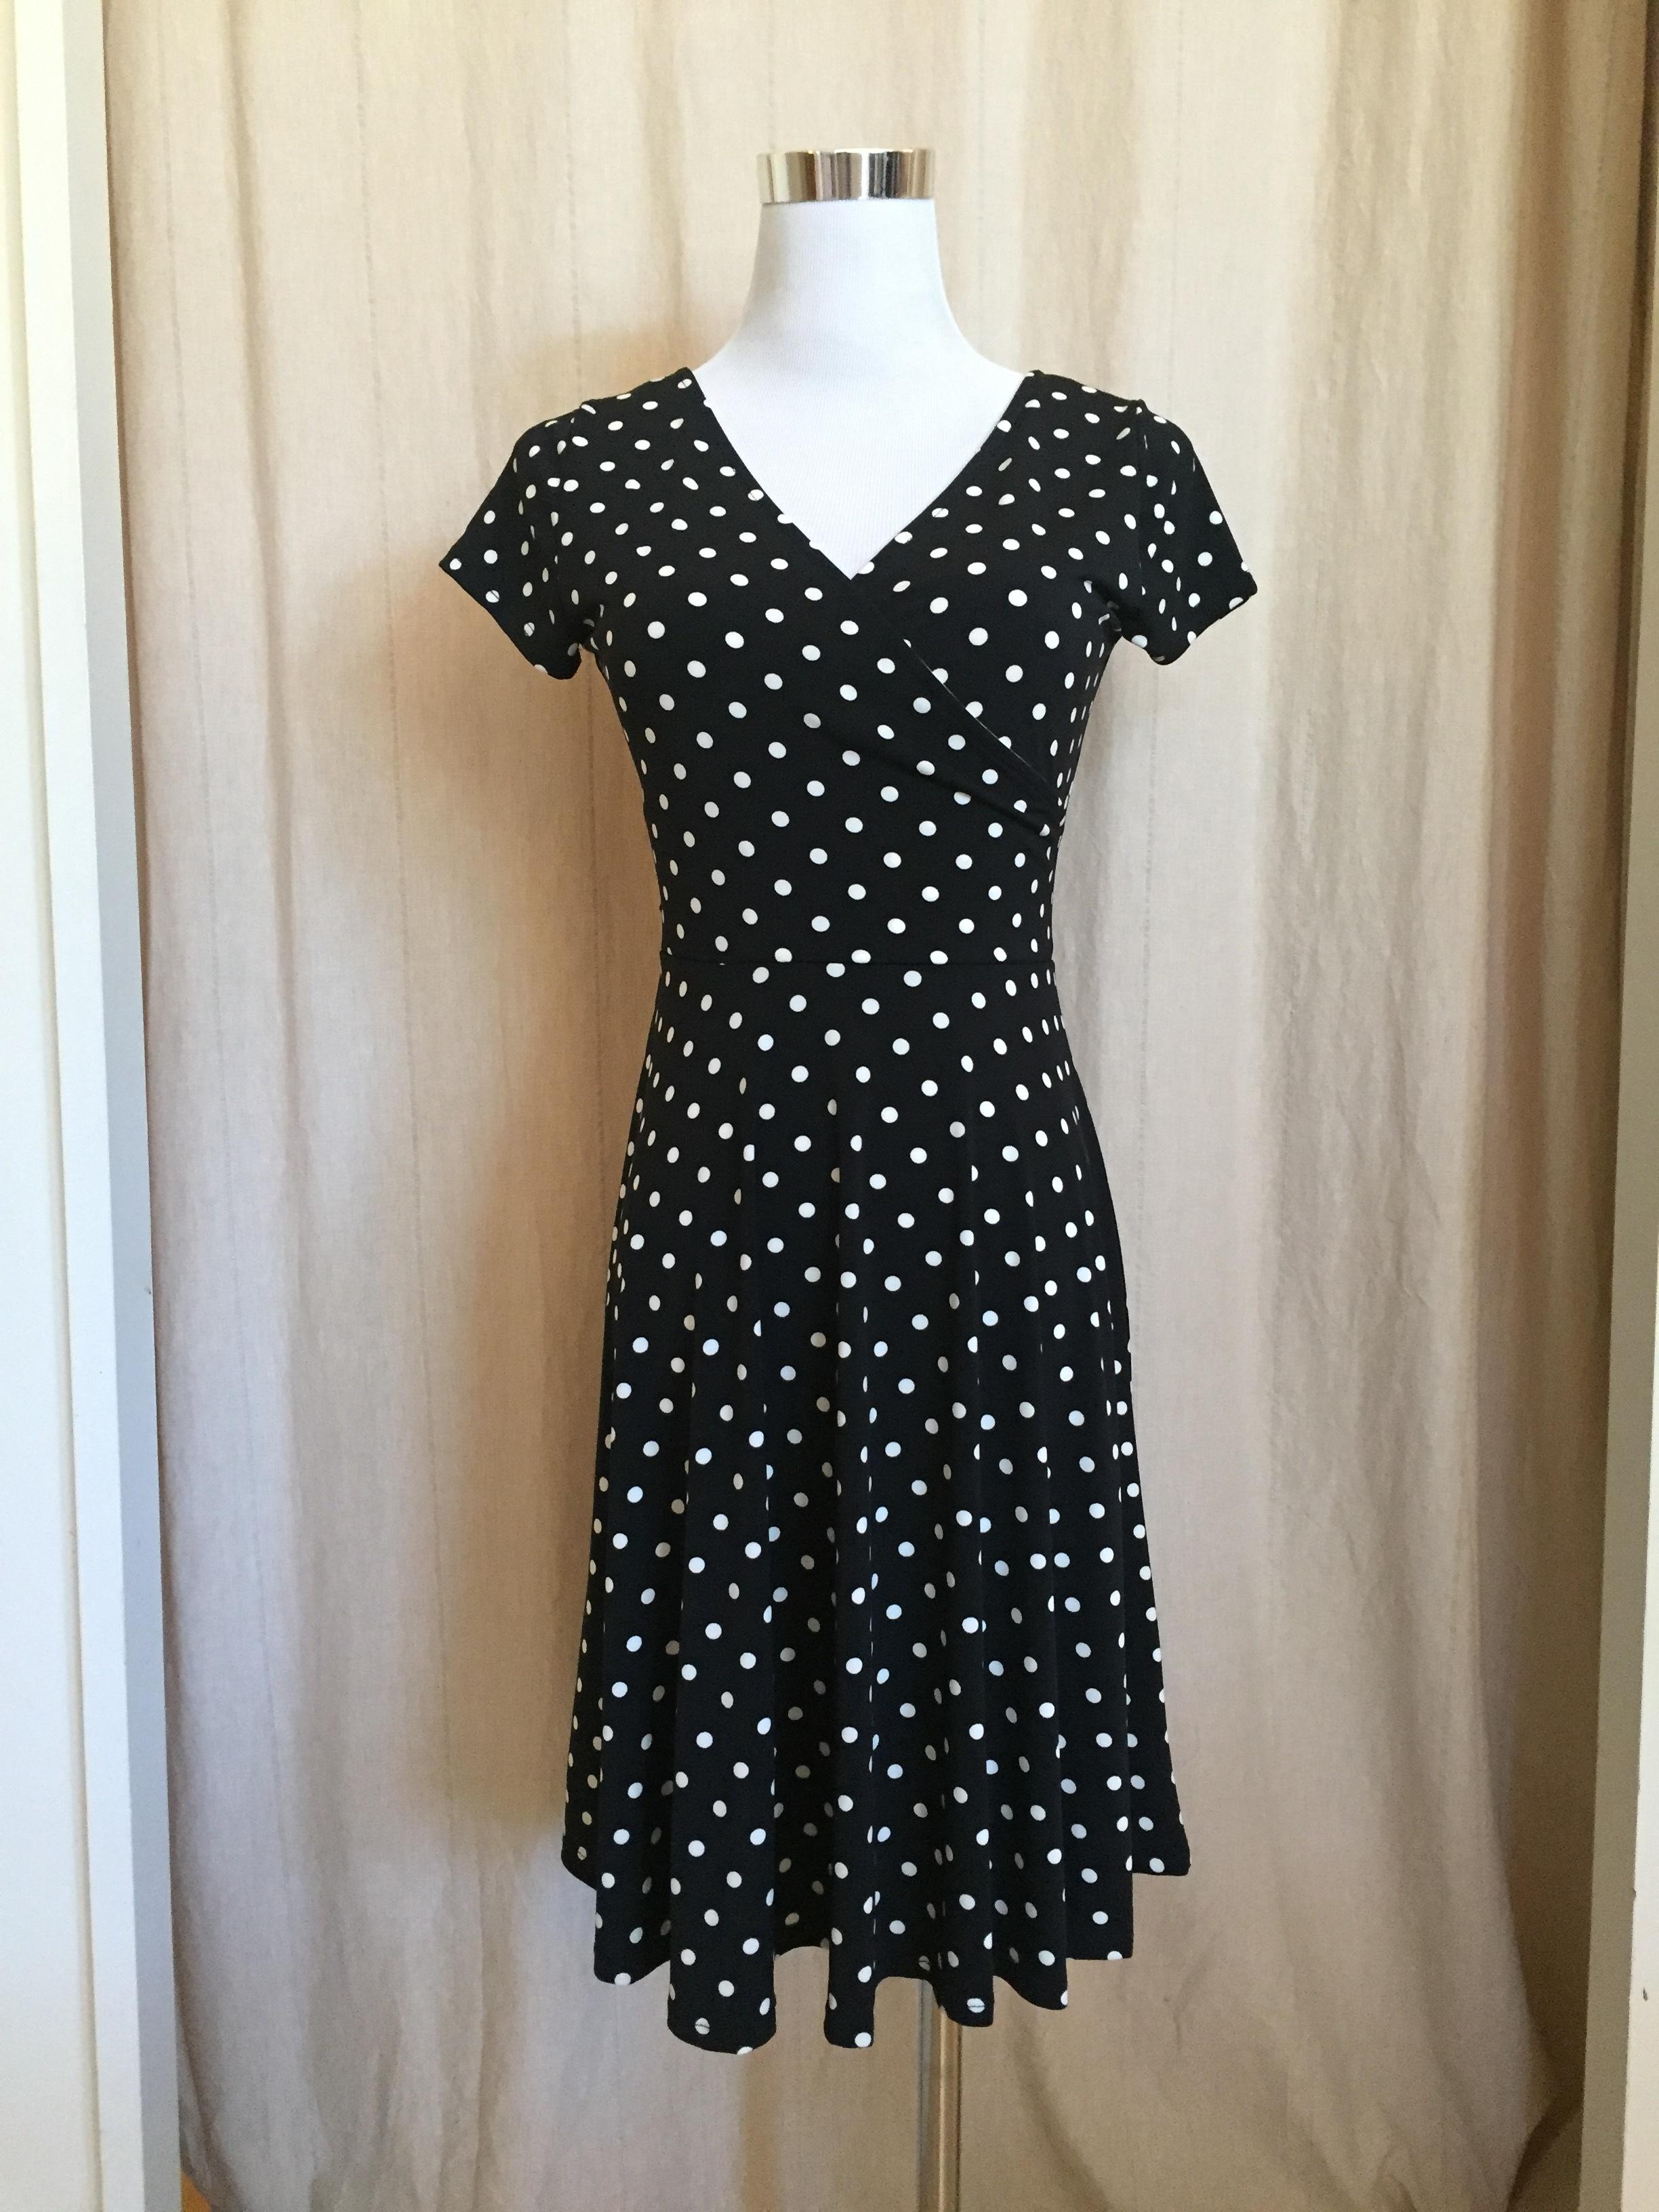 Flirty Polka Dot dress, $42